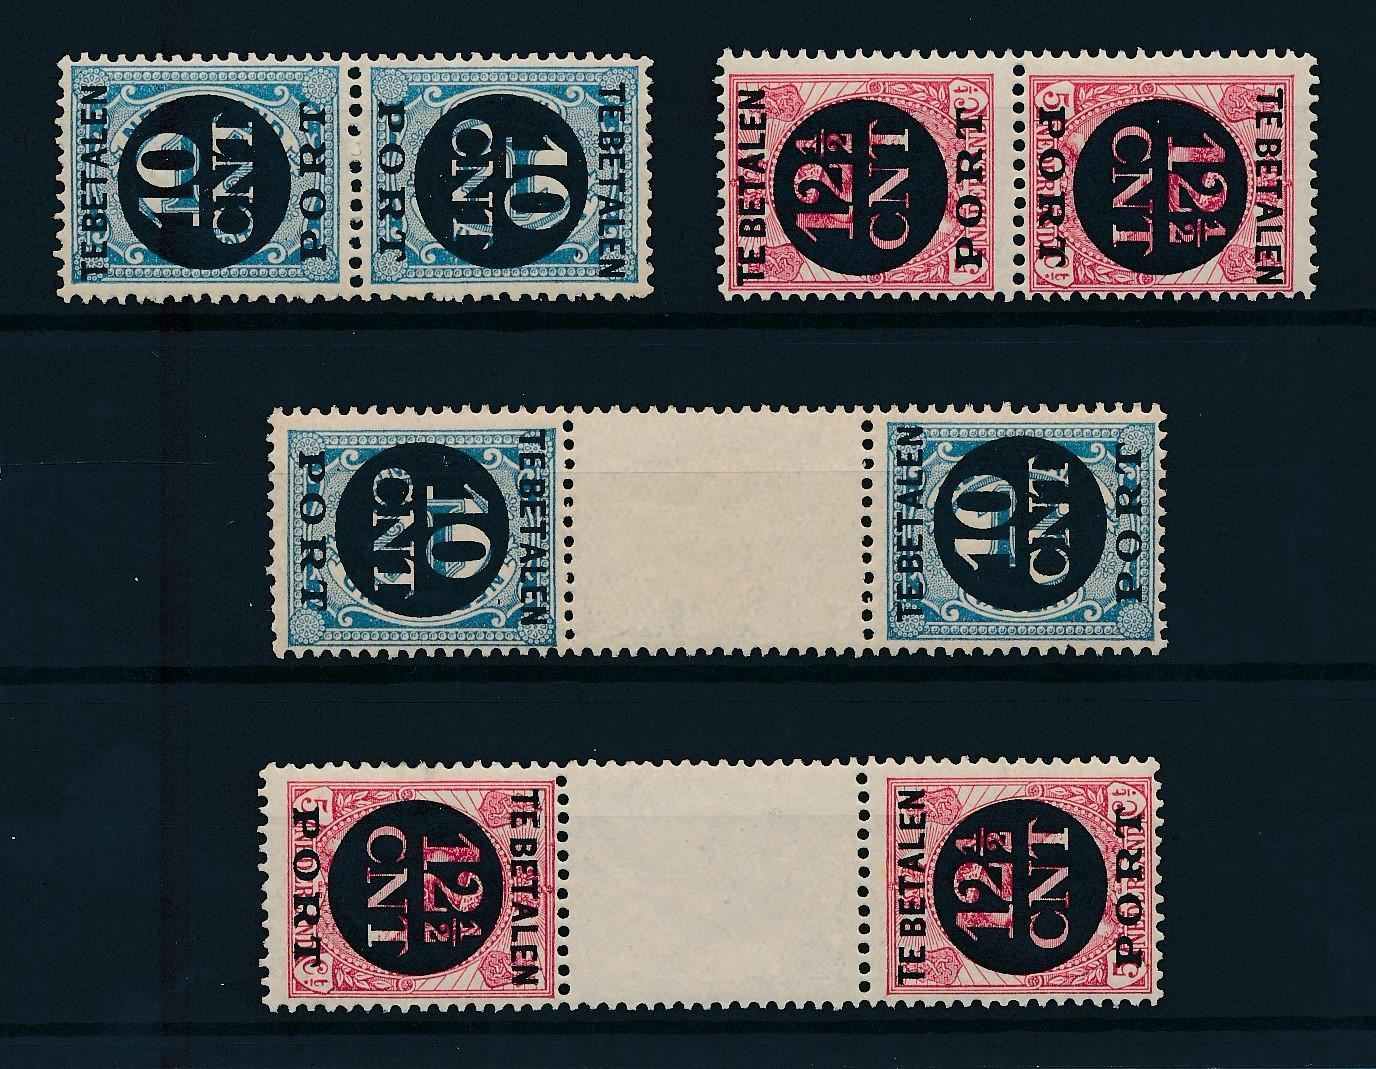 Nederland 1924 Portzegels Keerdrukken P67a-P68b postfris